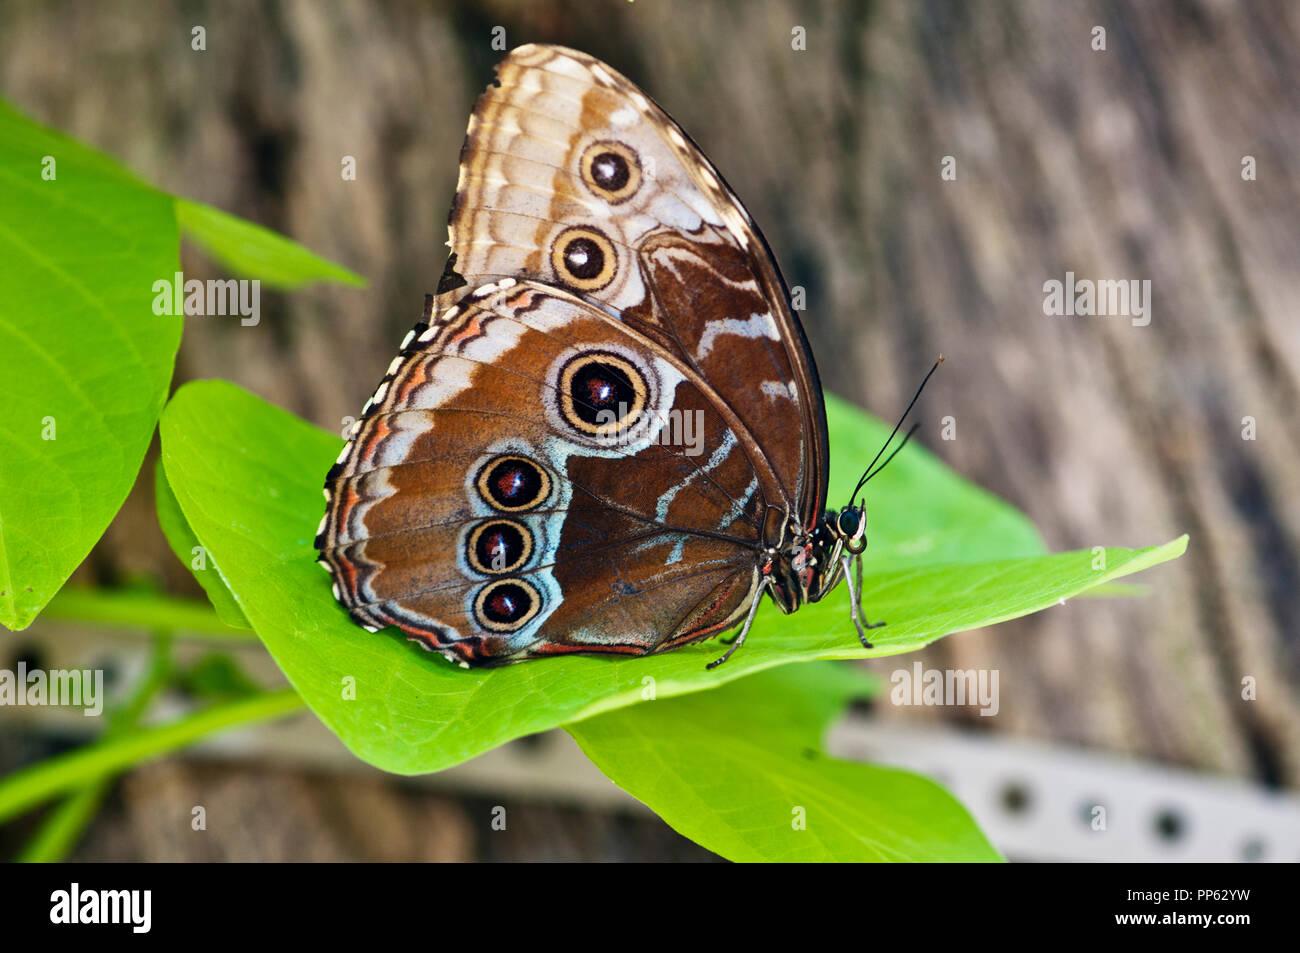 Ventrale Ansicht der blaue Morpho Butterfly Wing (Morpho peleides) im Schmetterling Anzeige an die Boise City Zoo in Boise Idaho Stockbild